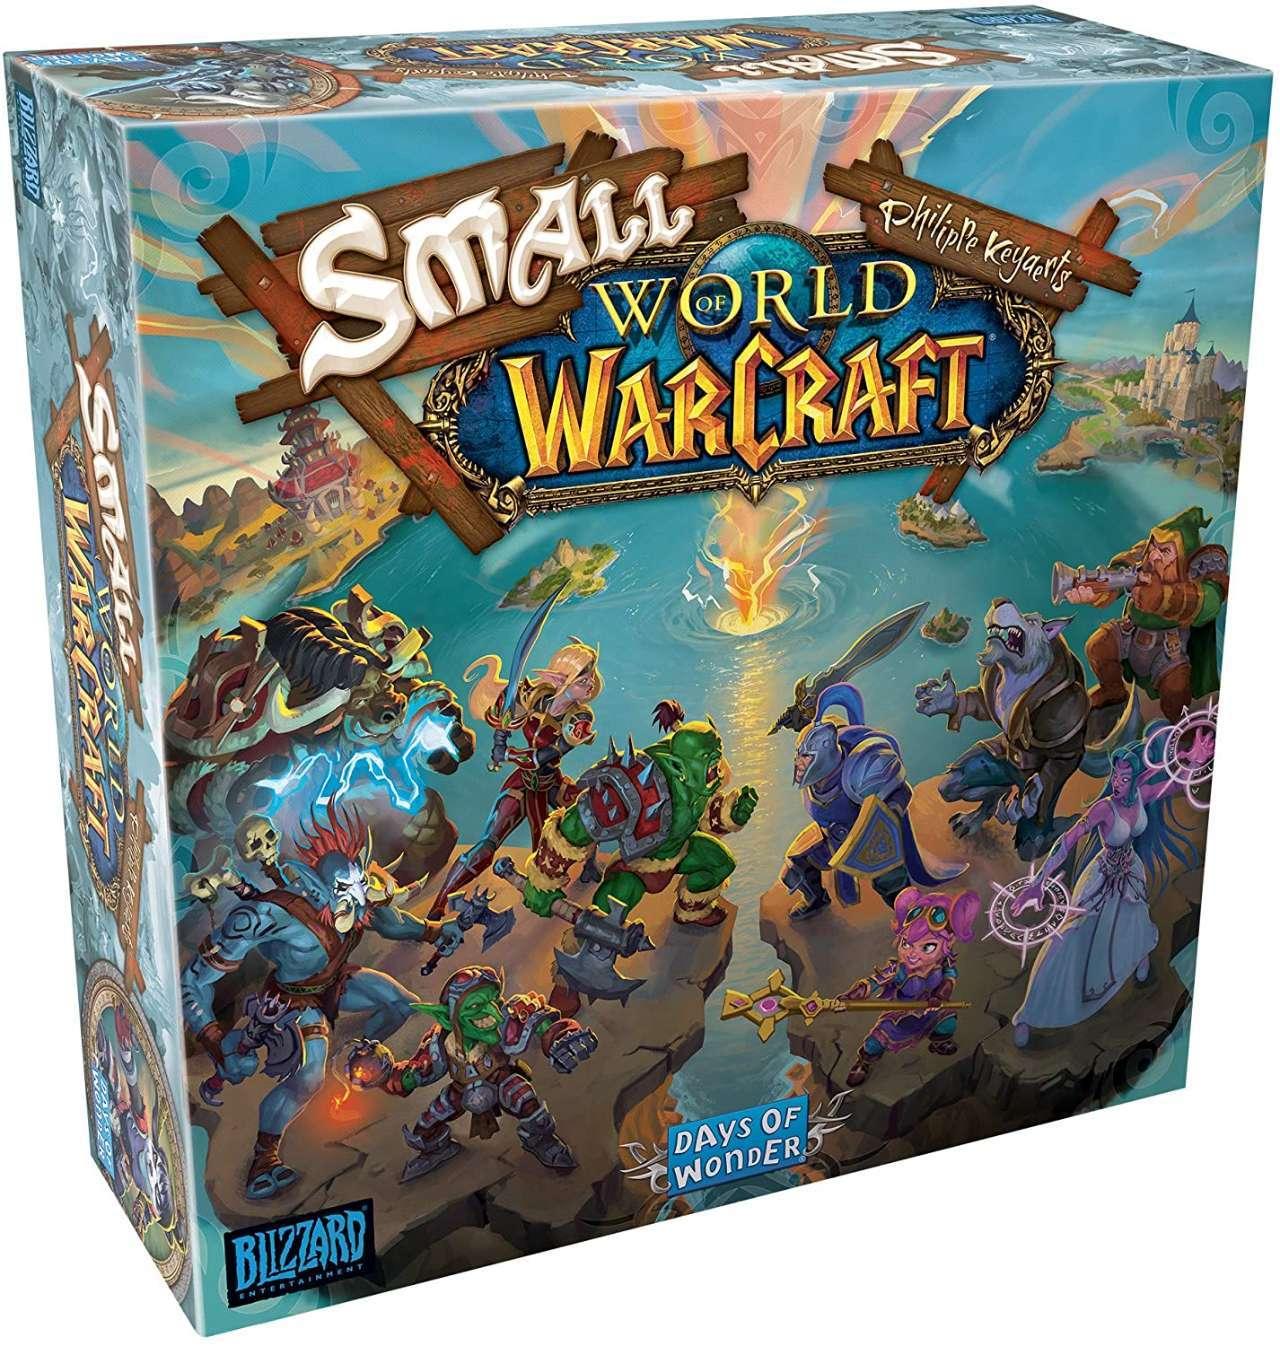 small-world-of-warcraft-91HVXPfKSOL_AC_SL1500_